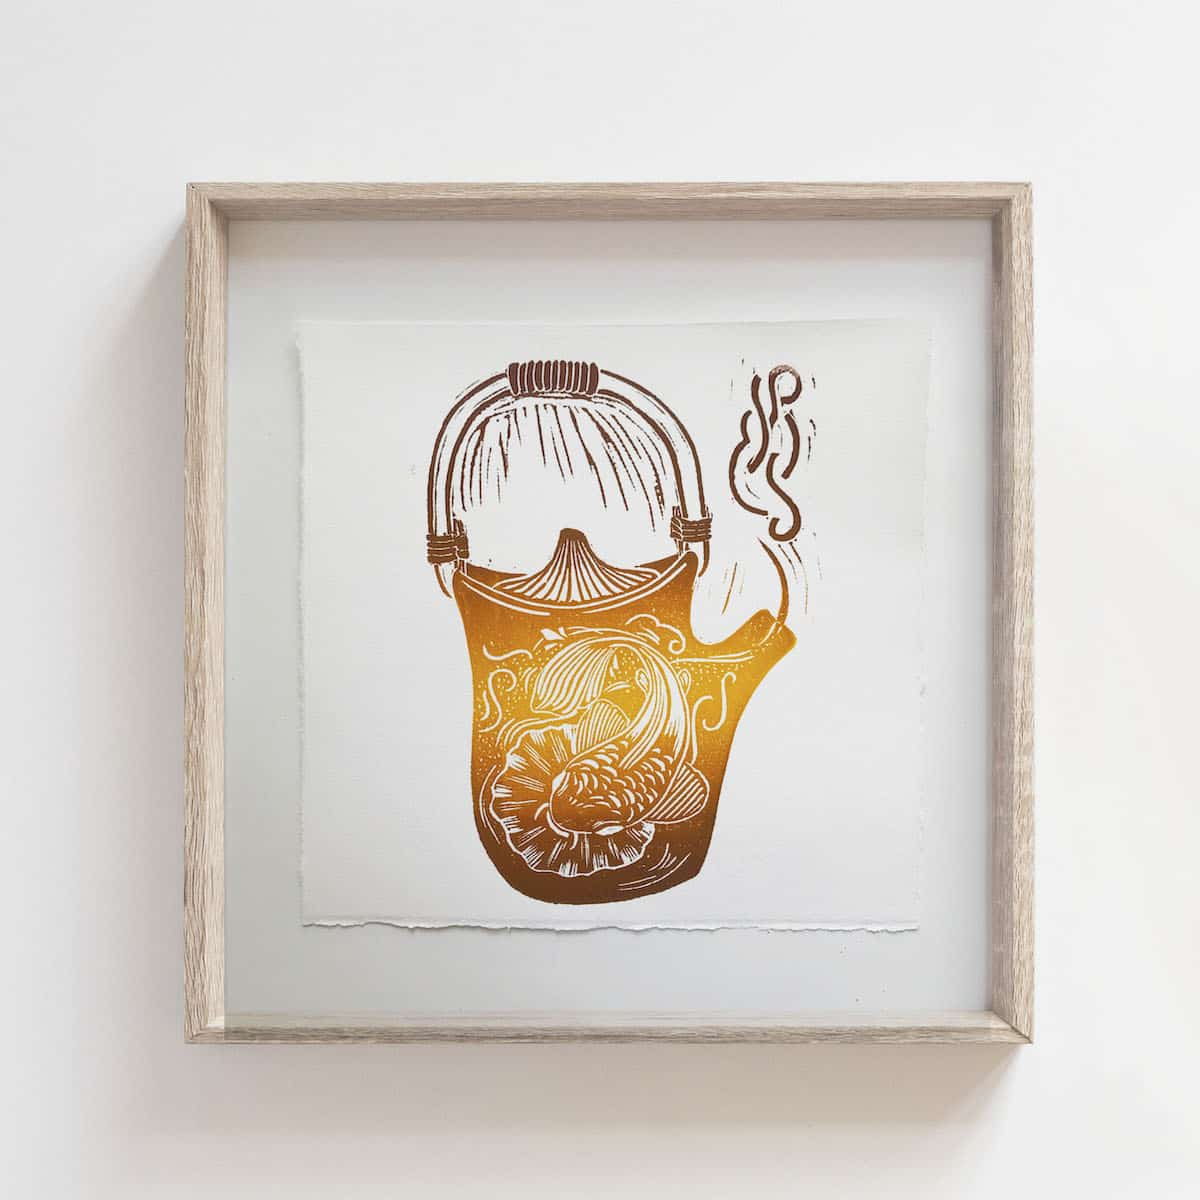 (Linoprint) Teapot Series: Lucky Fish – By Jocelin Meredith Artwork